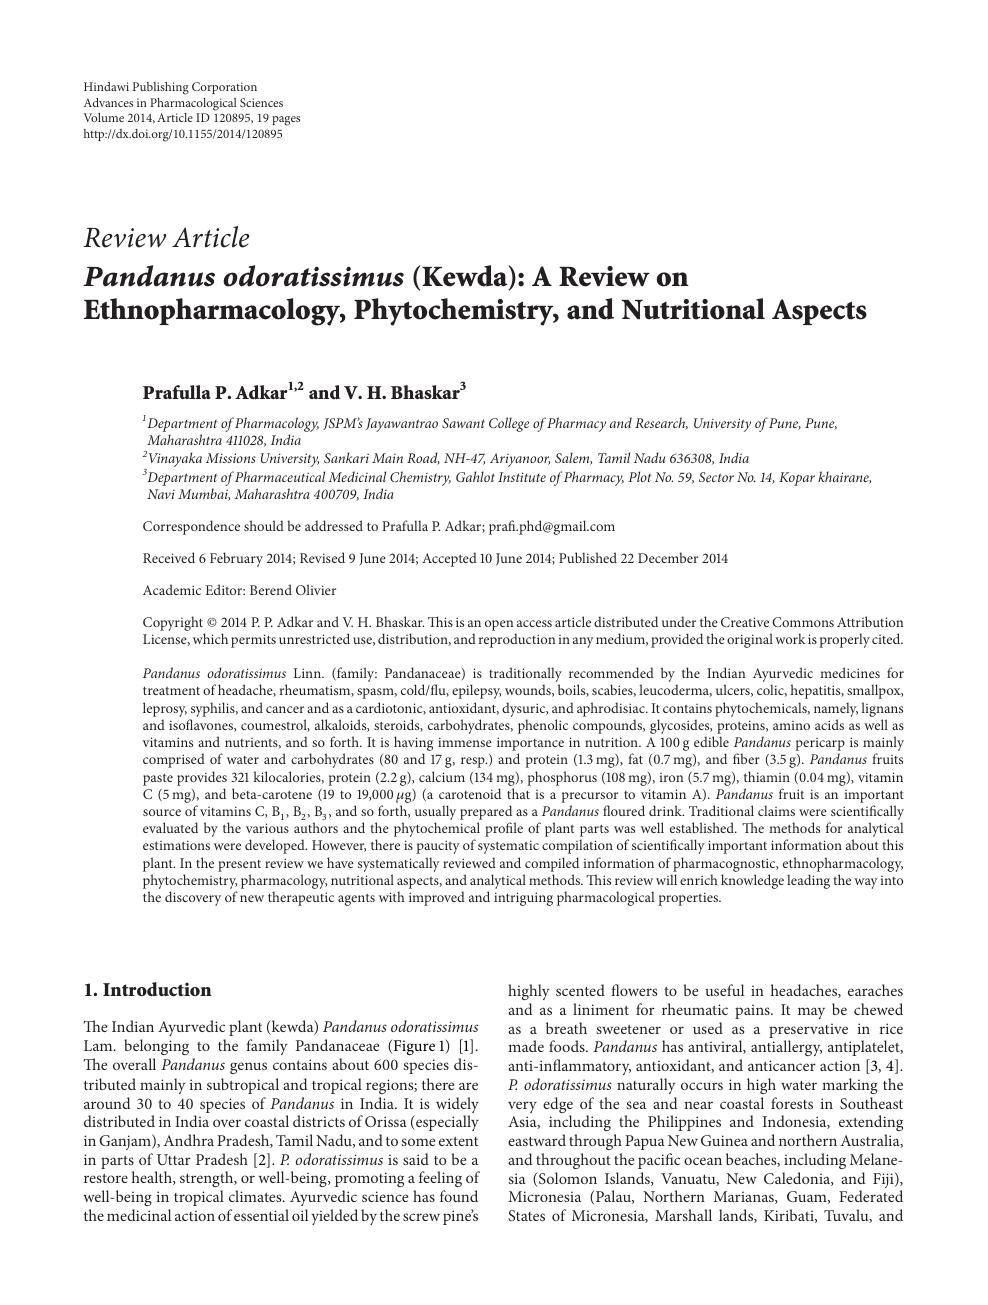 Pandanus odoratissimus (Kewda): A Review on Ethnopharmacology